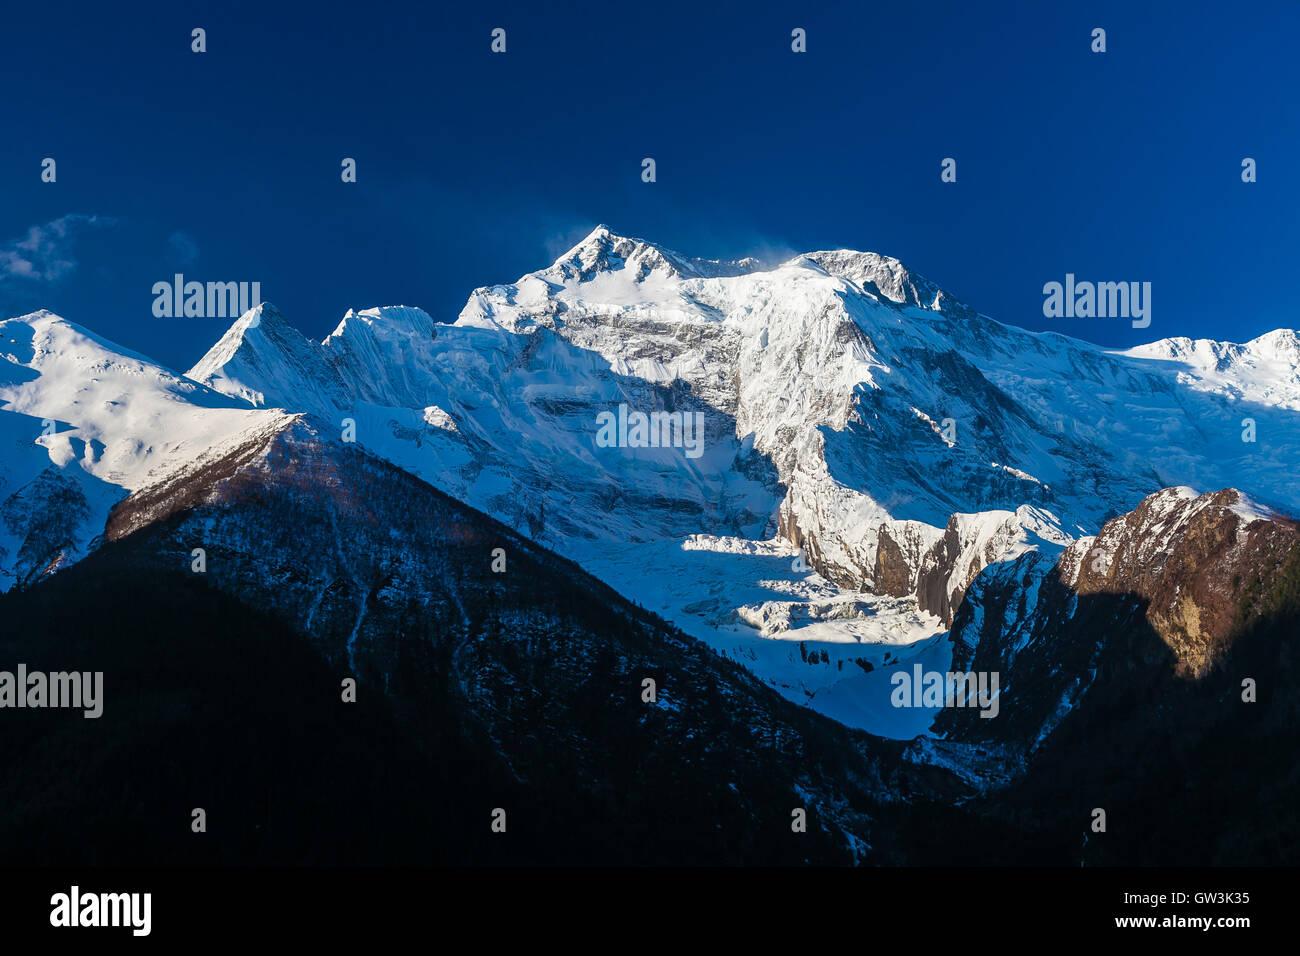 Landscapes Snow Mountains Peak Nature Morning Viewpoint.Mountain Trekking Landscape Background. Nobody photo. Horizontal - Stock Image